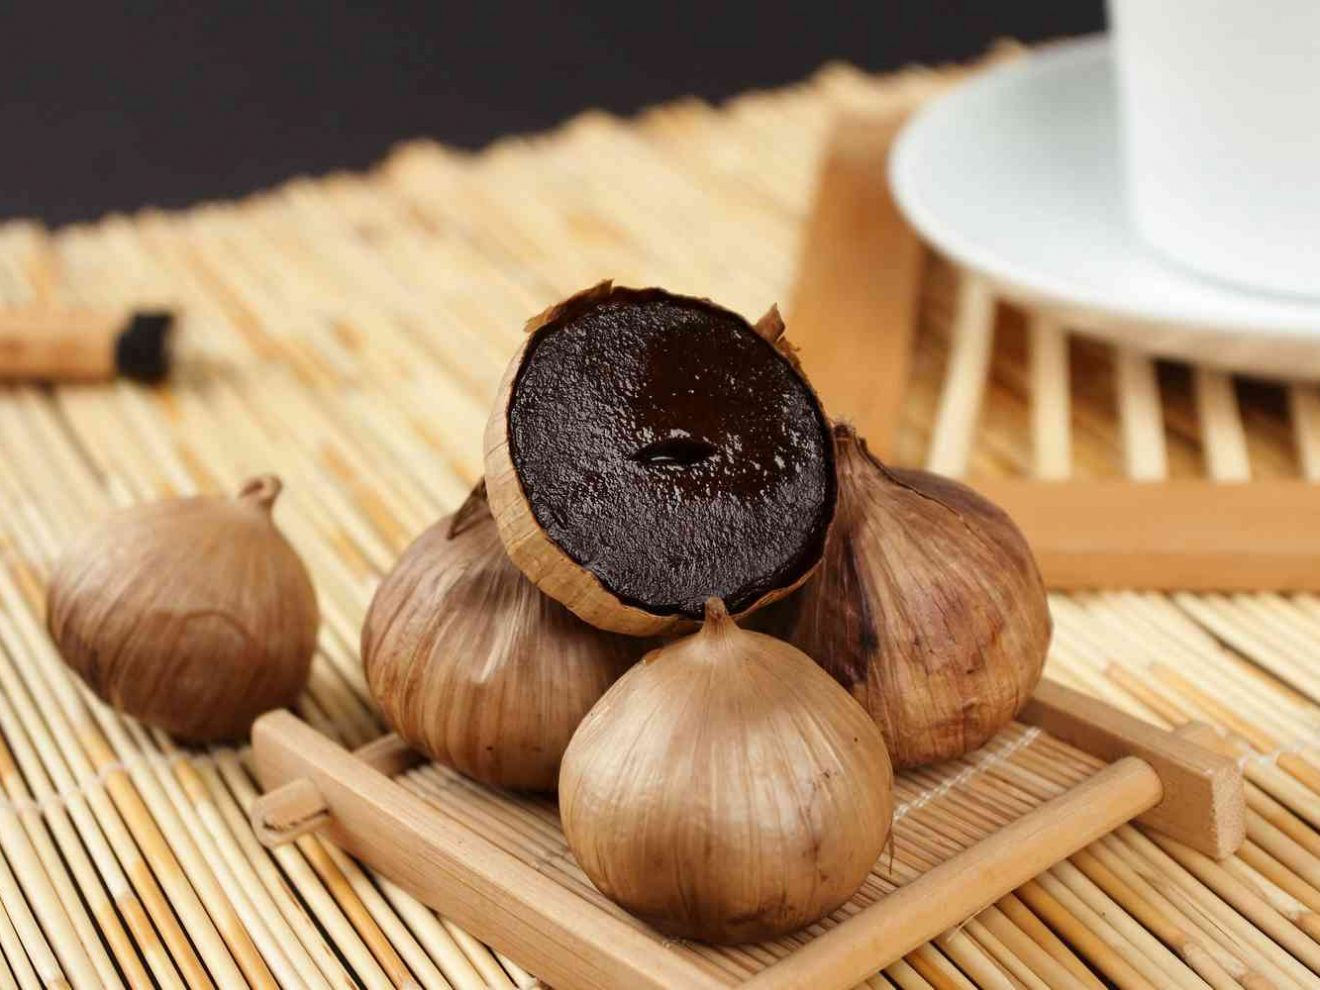 fresh black garlic made by black garlic making machine